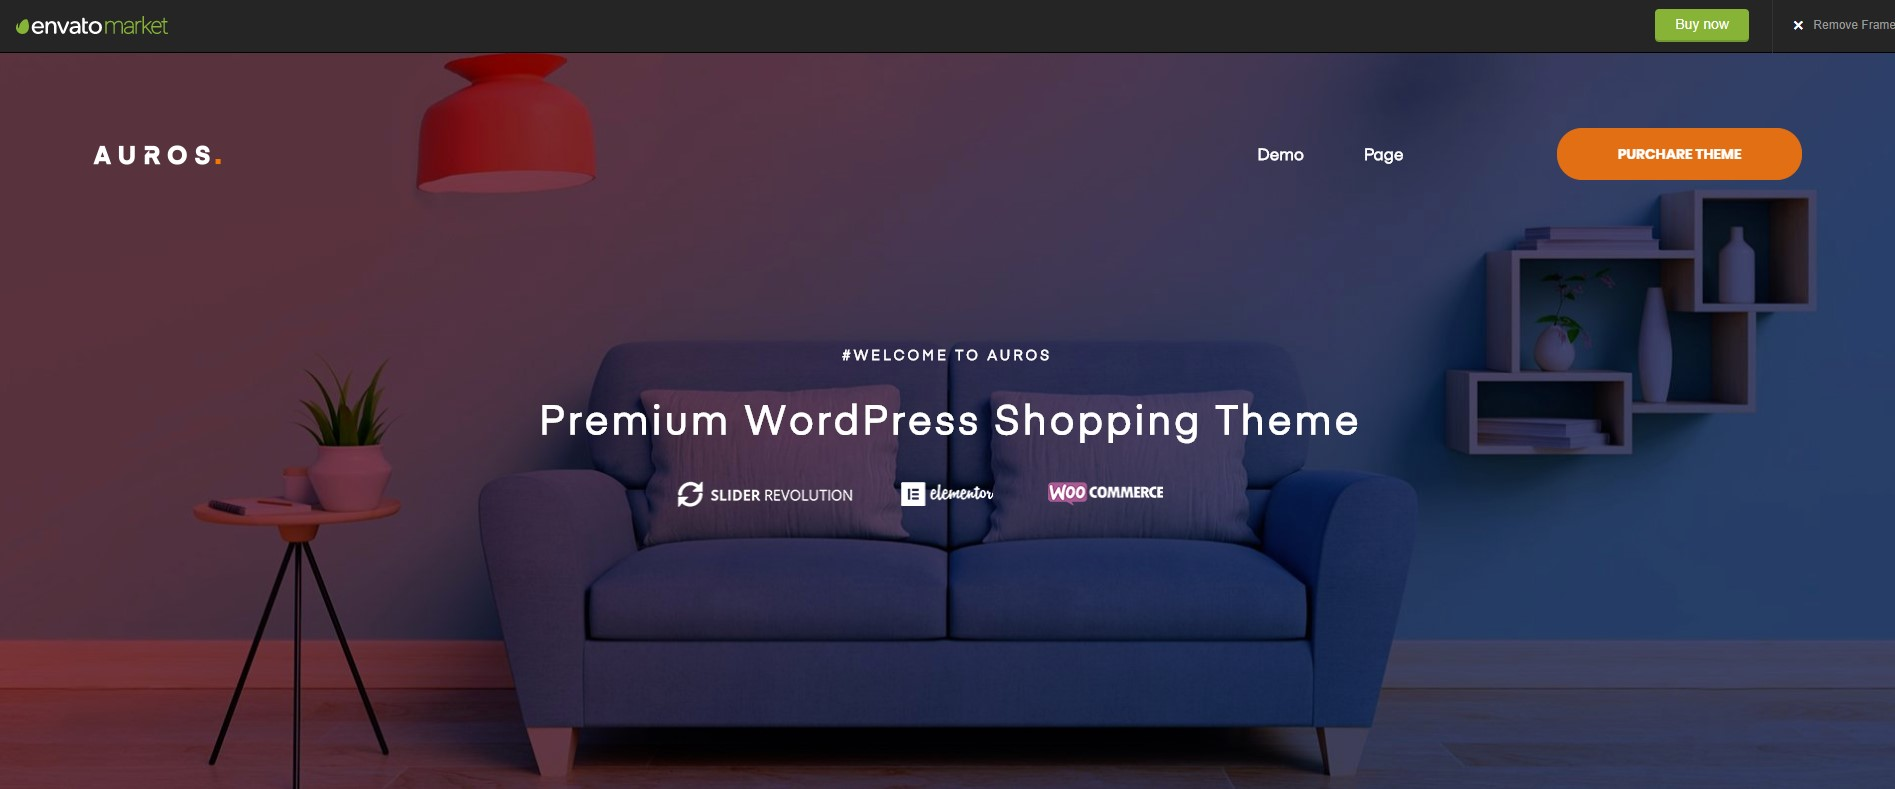 Auros Furniture WordPress Theme